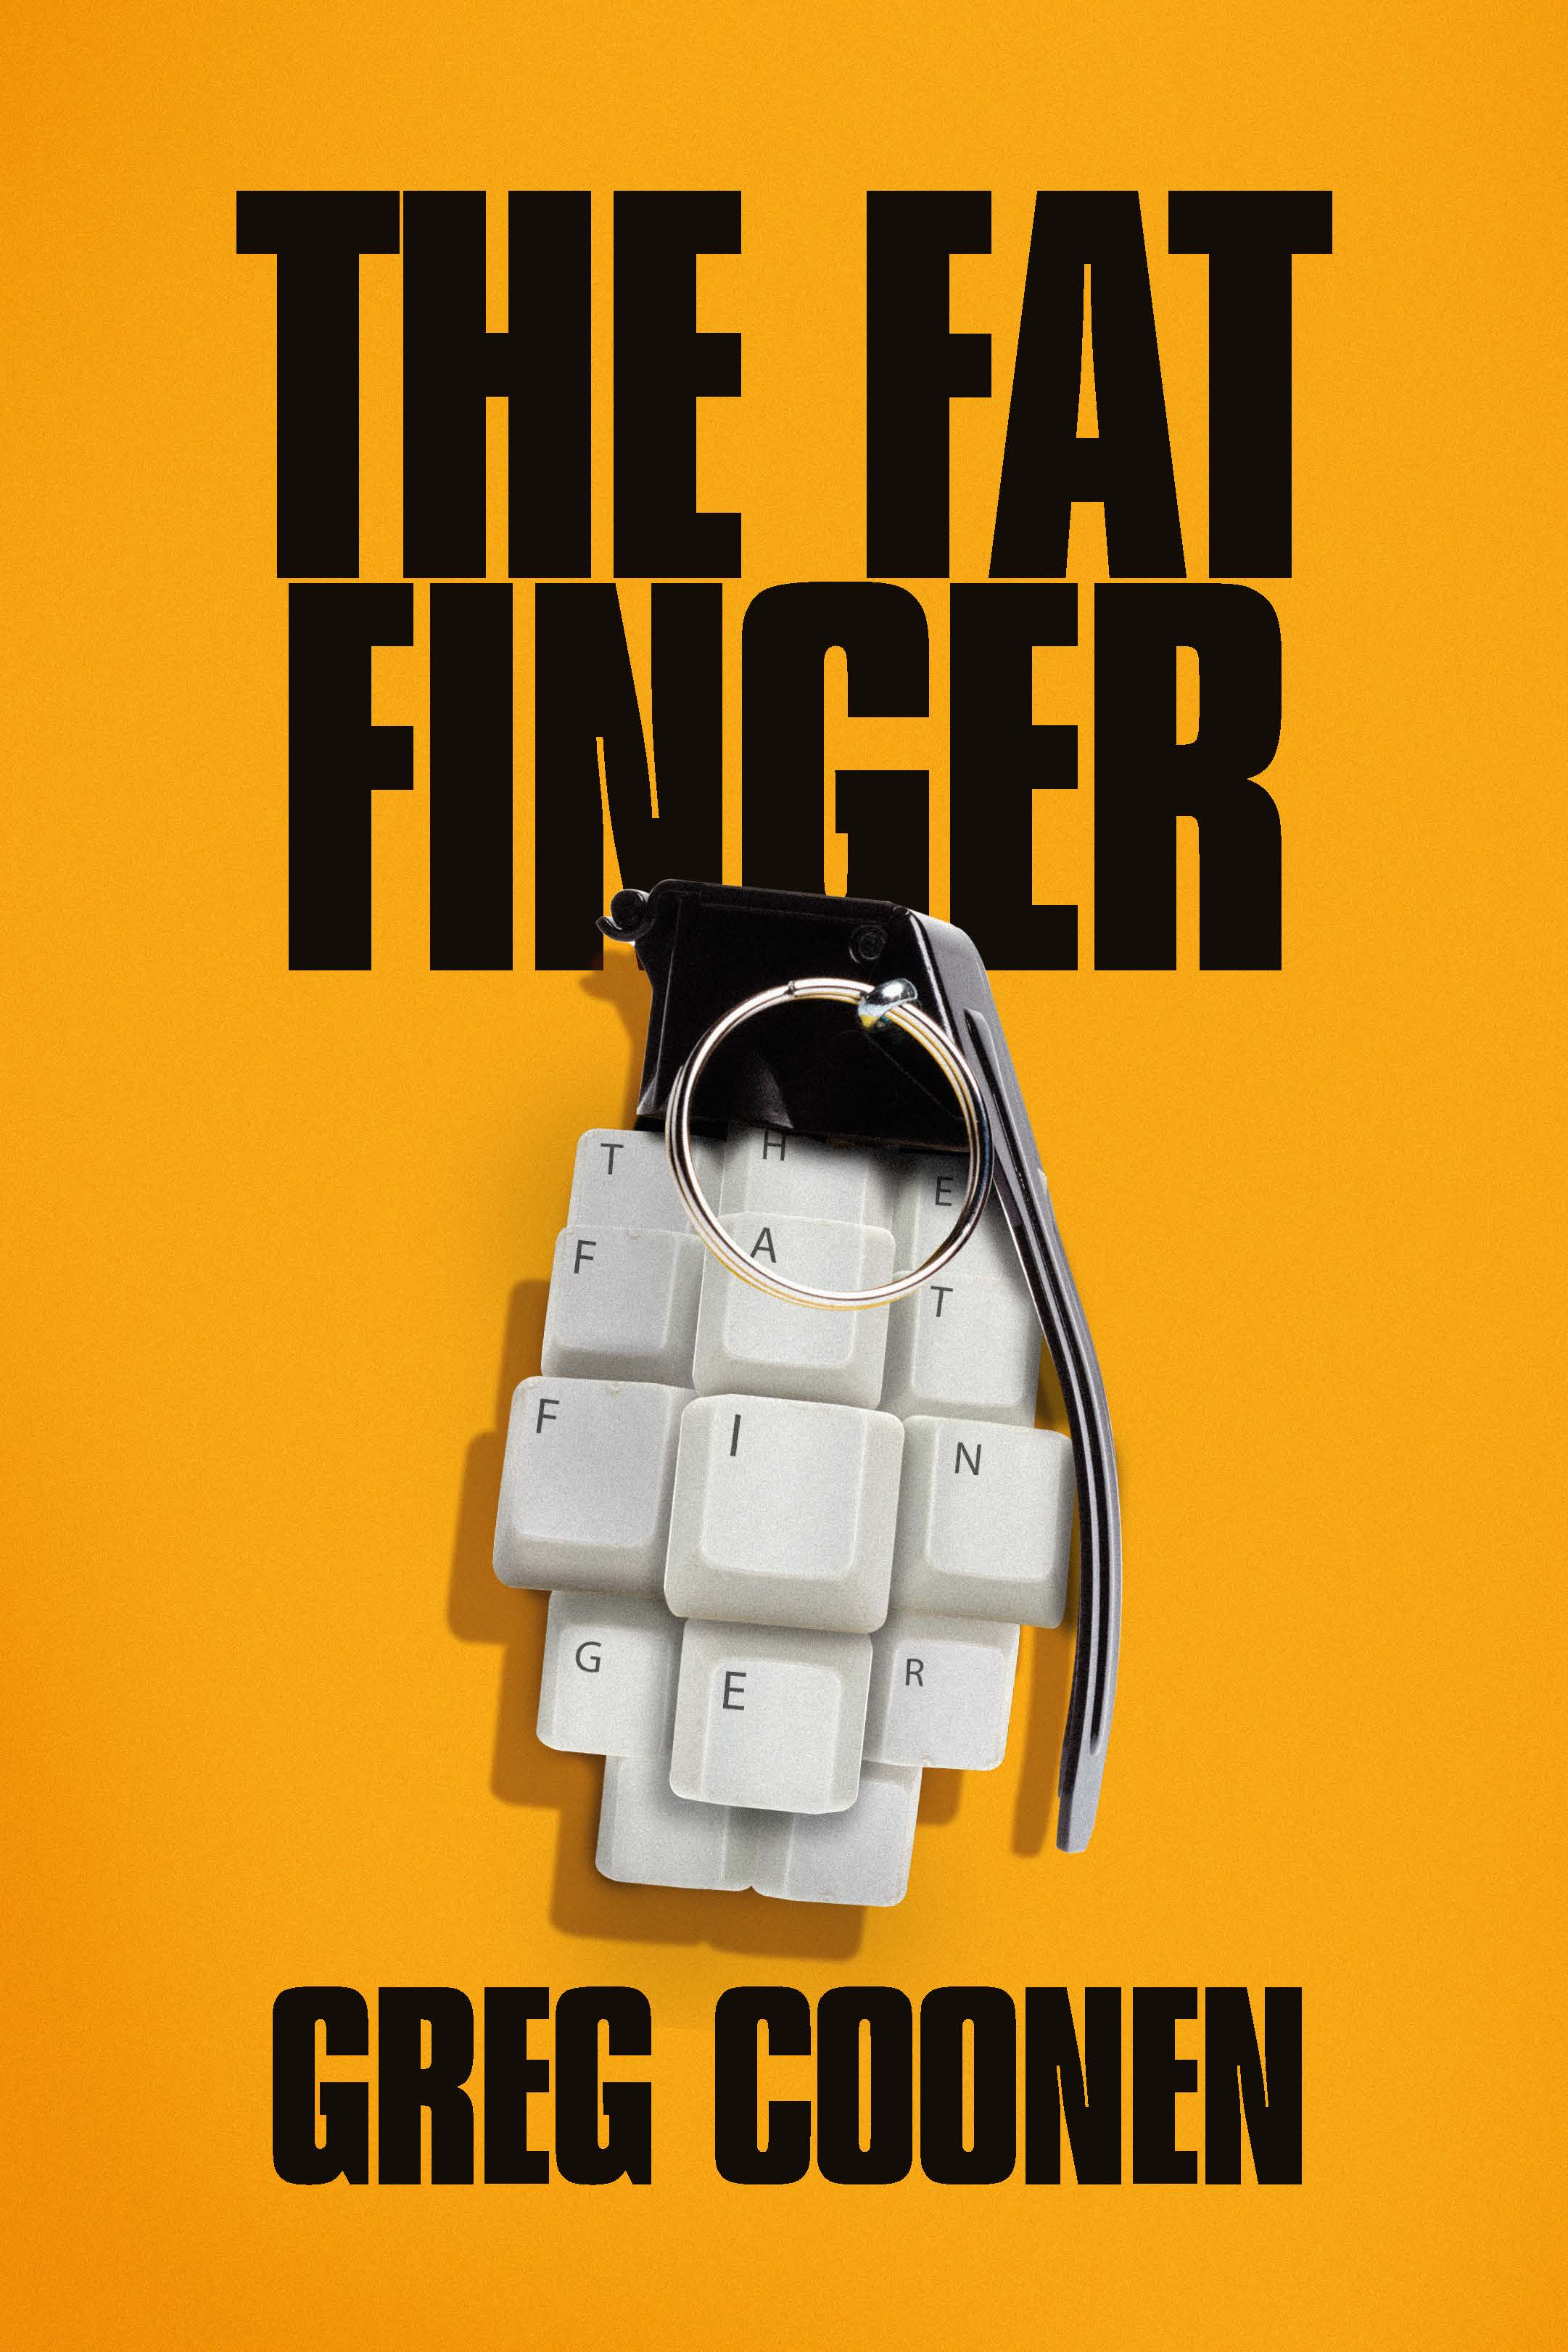 The Fat Finger